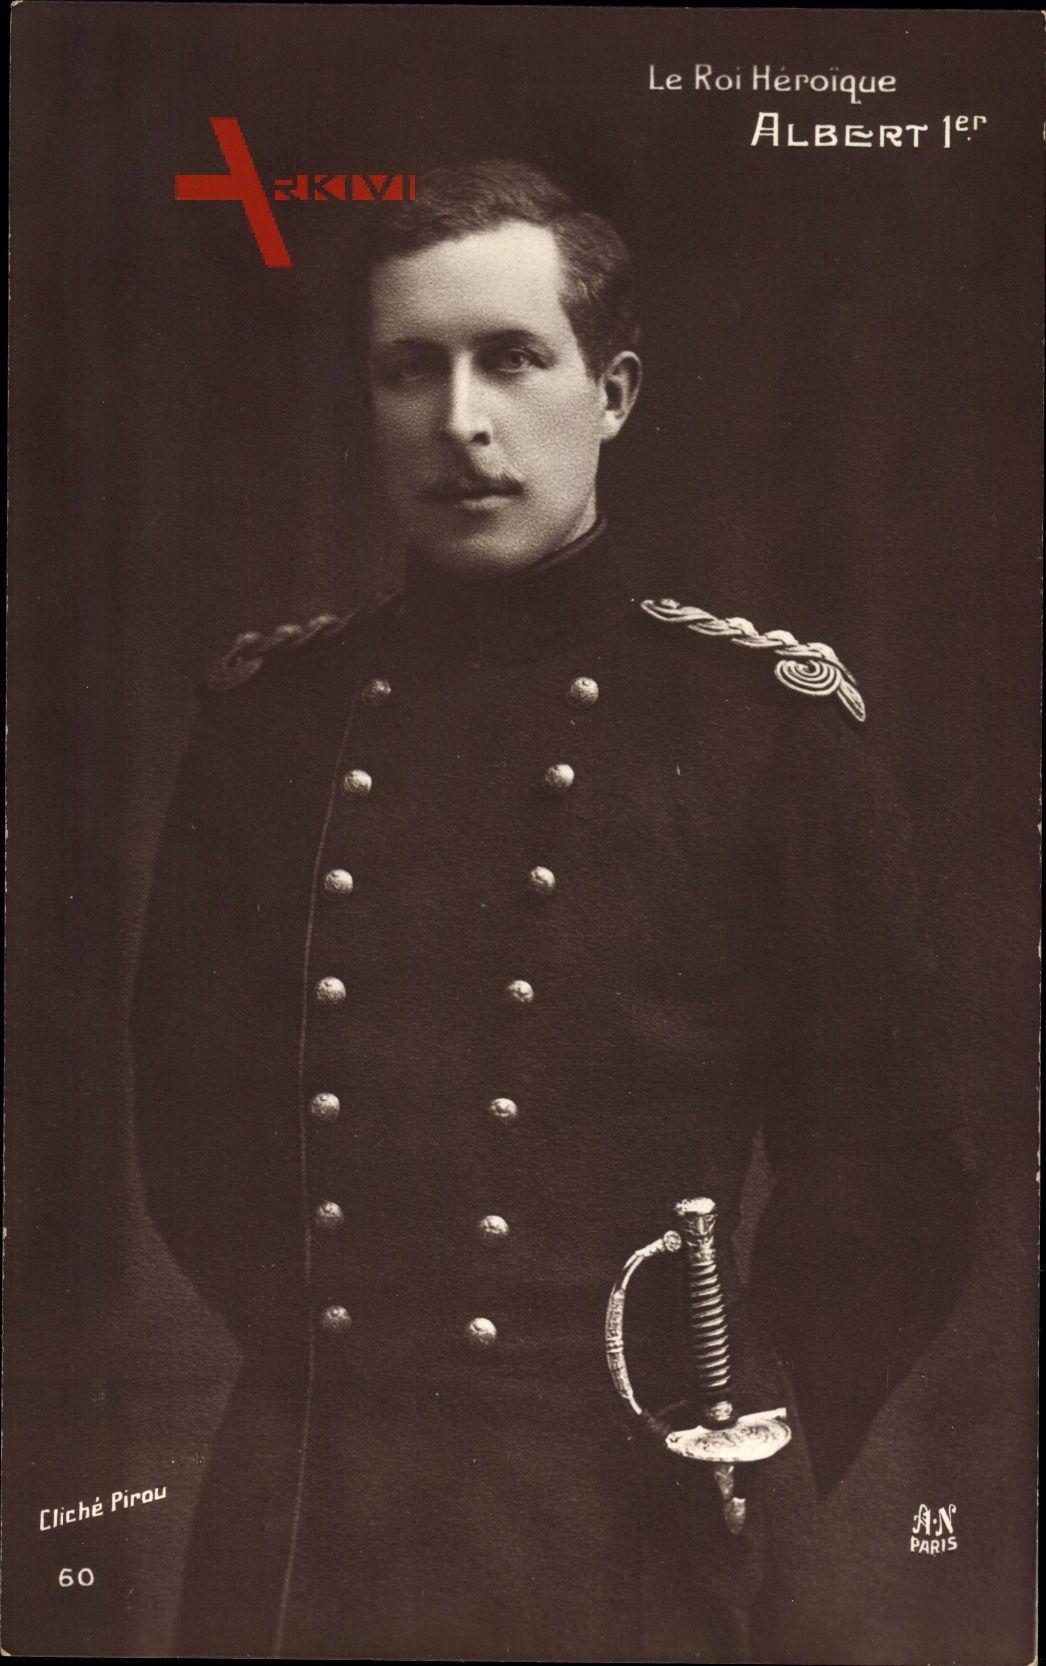 König Albert I. von Belgien, Roi Héroique, Portrait, Säbel, Uniform